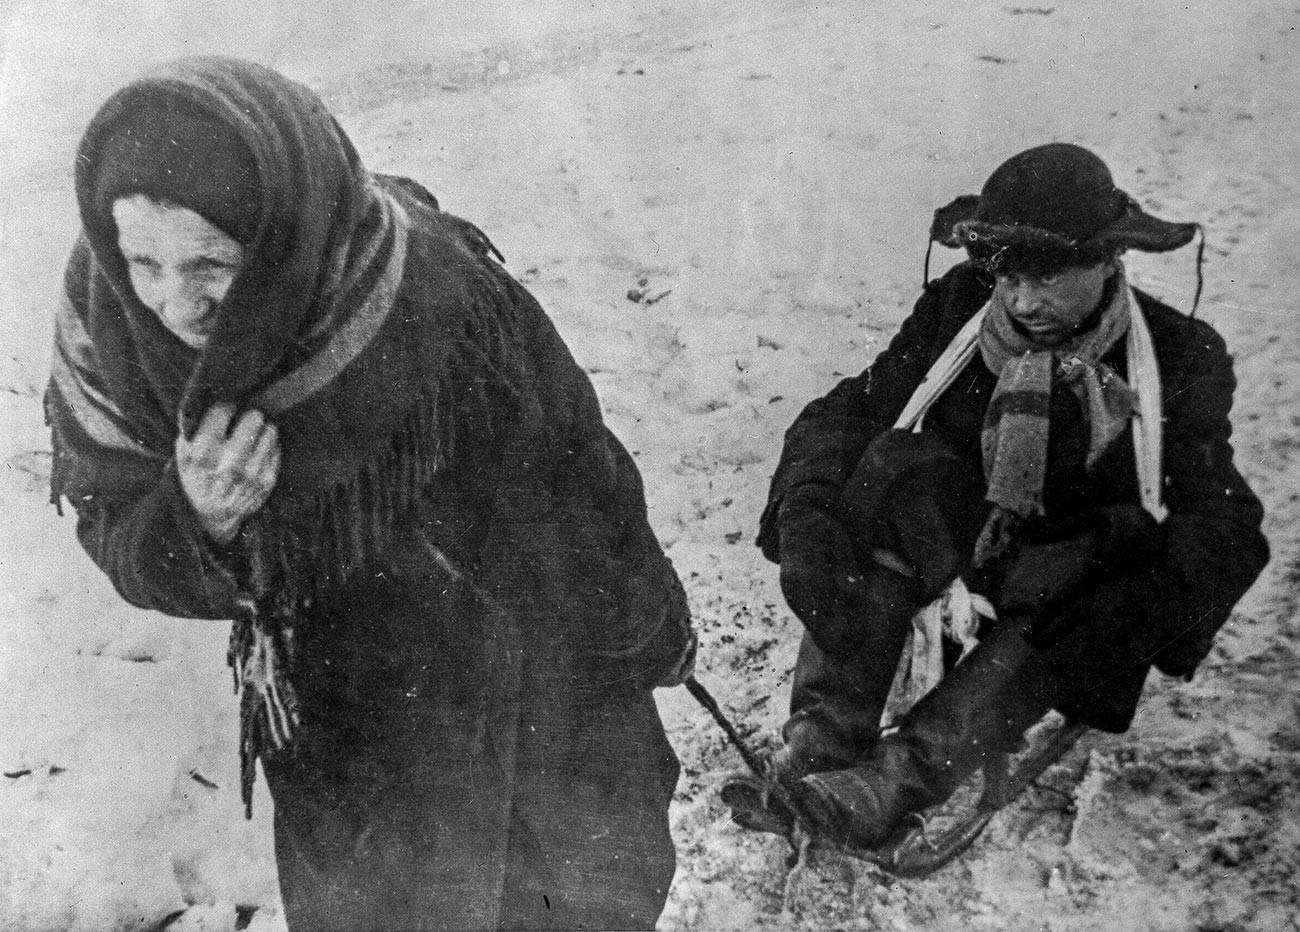 Blokada Lenjingrada (8. rujna 1941. – 27. siječnja 1944.). Žena na sanjkama vuče muža iscrpljenog od gladi. Veliki domovinski rat (1941.-1945.).